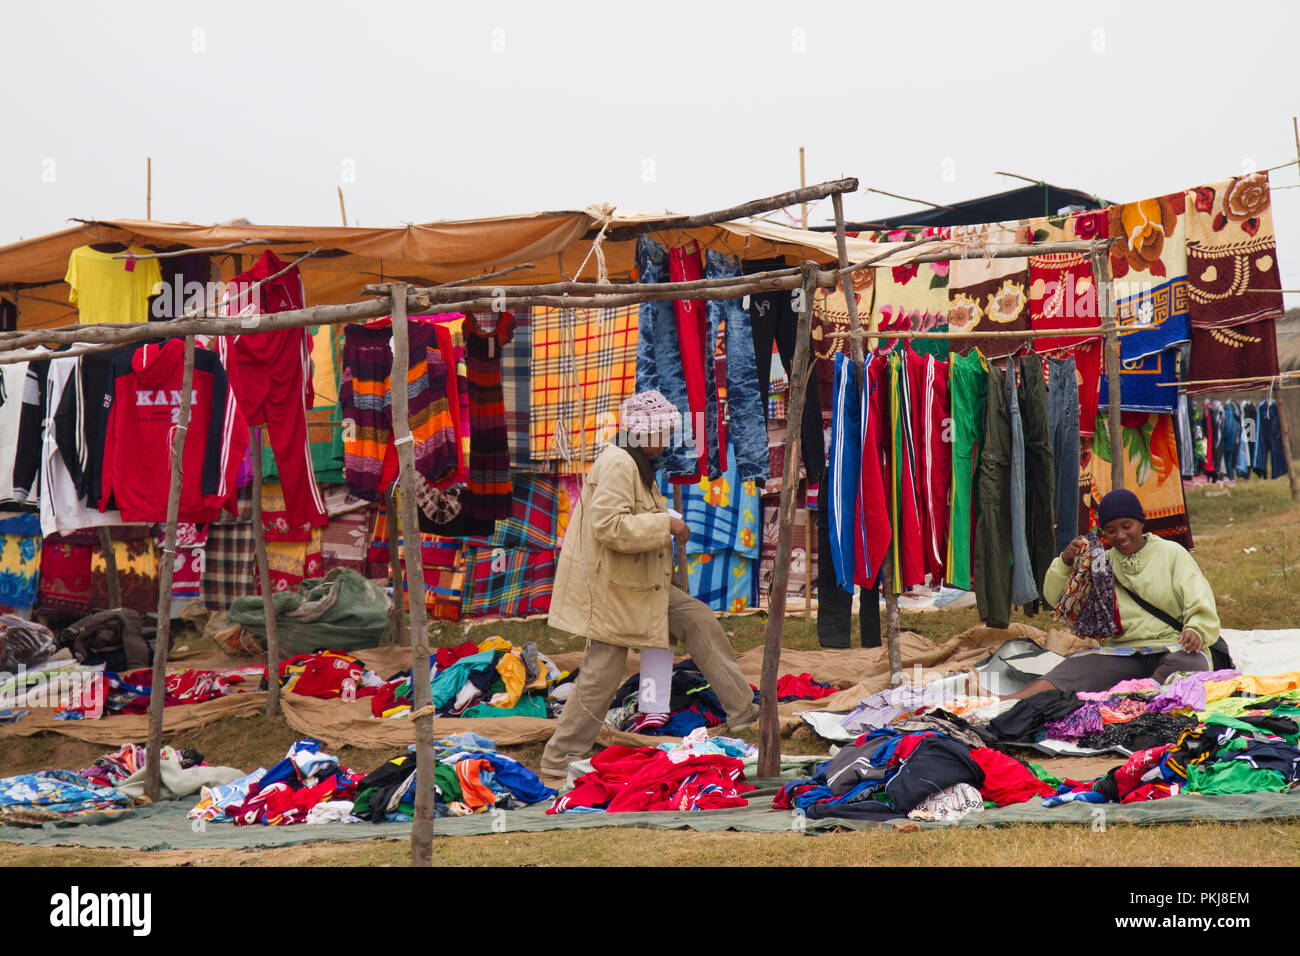 Madagascan farmers market, Madagascar - Stock Image